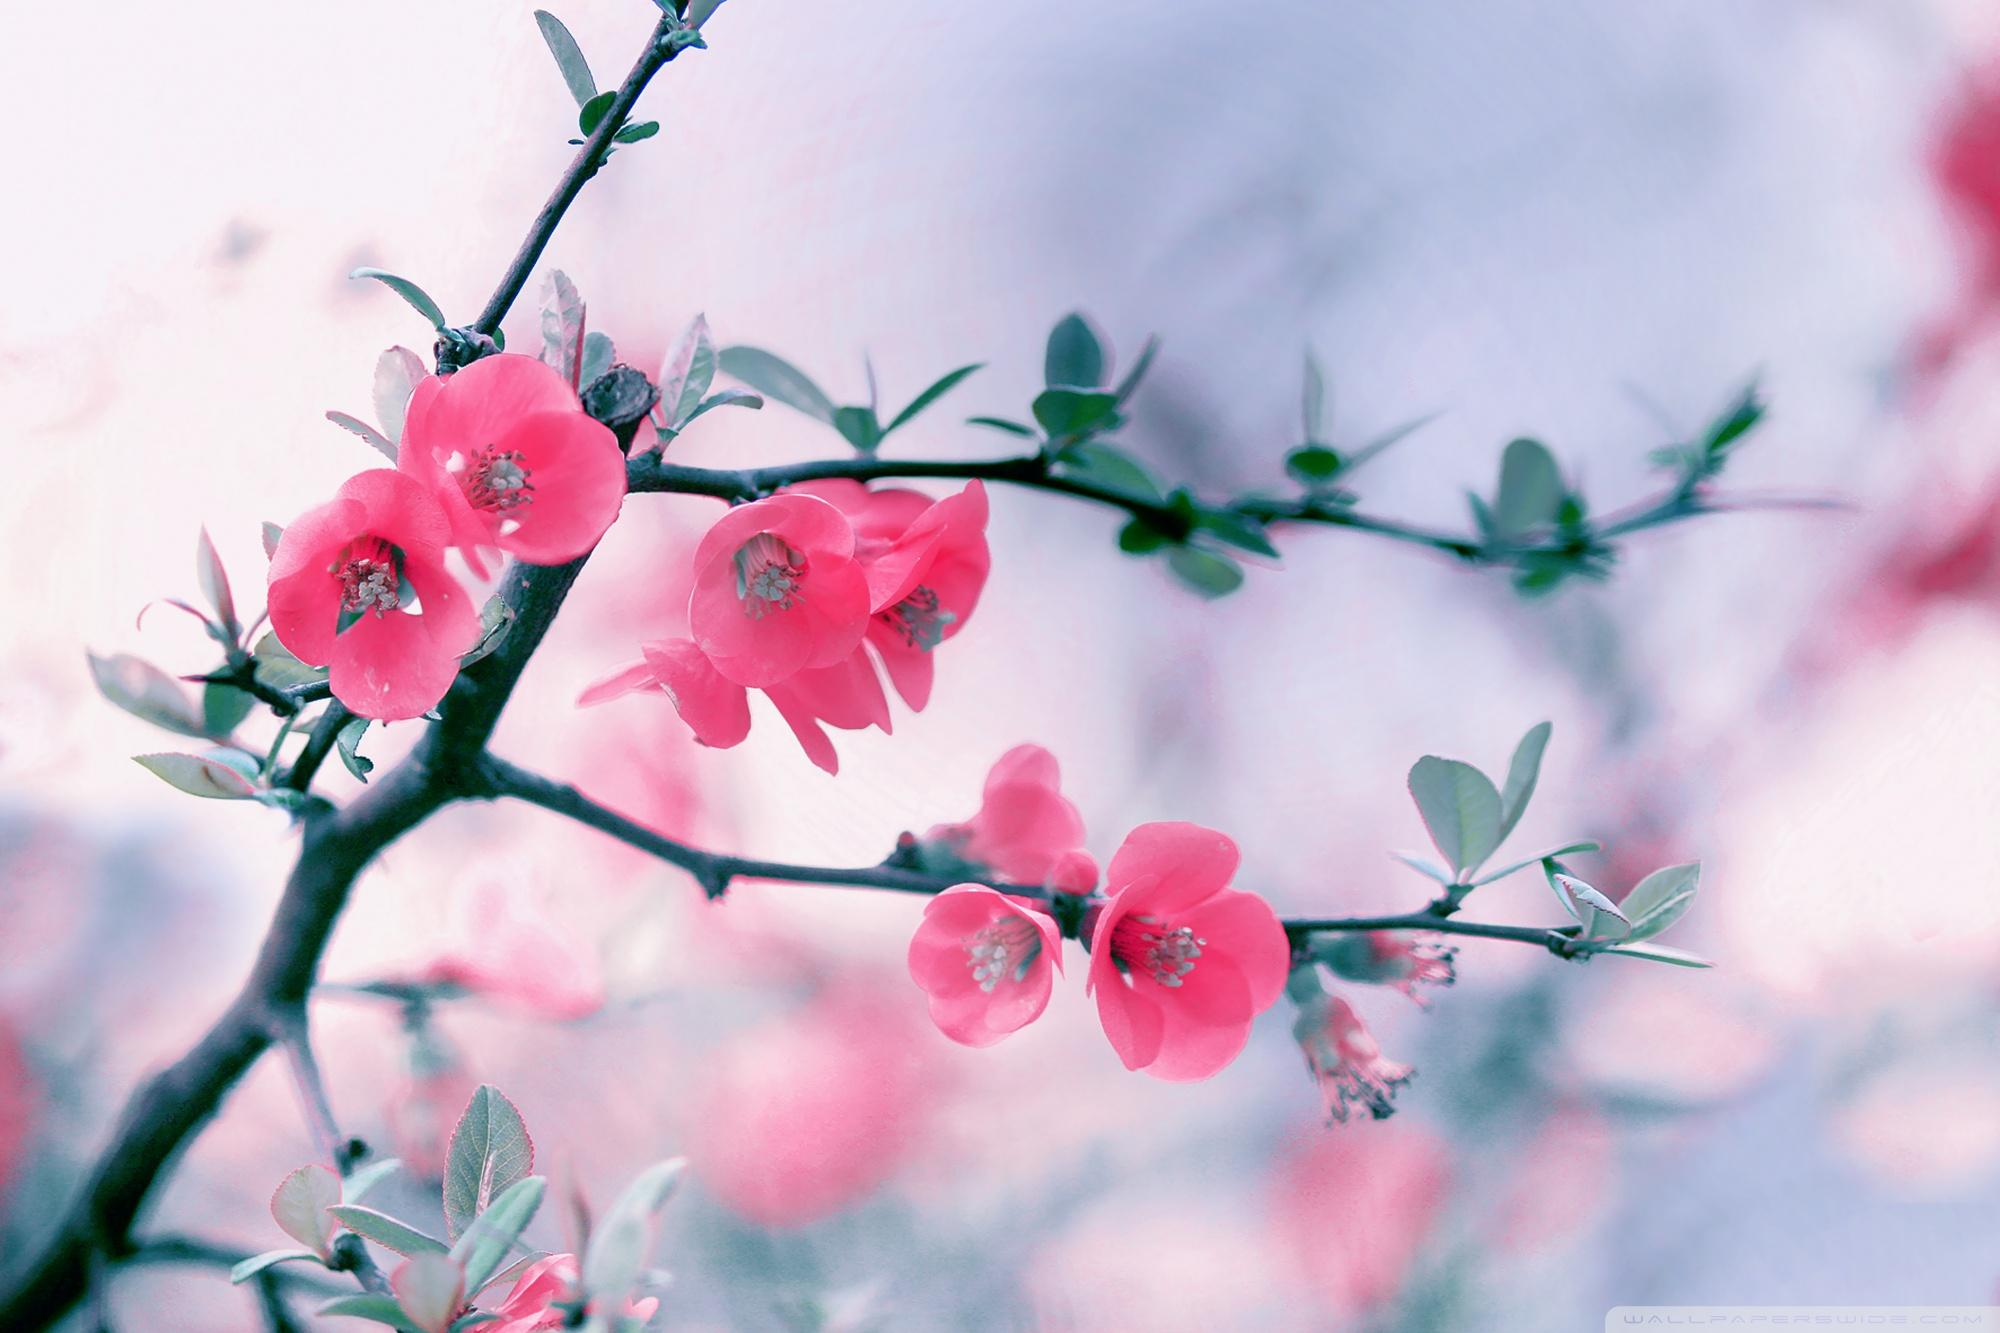 pink blossom flowers, spring ❤ 4k hd desktop wallpaper for 4k ultra